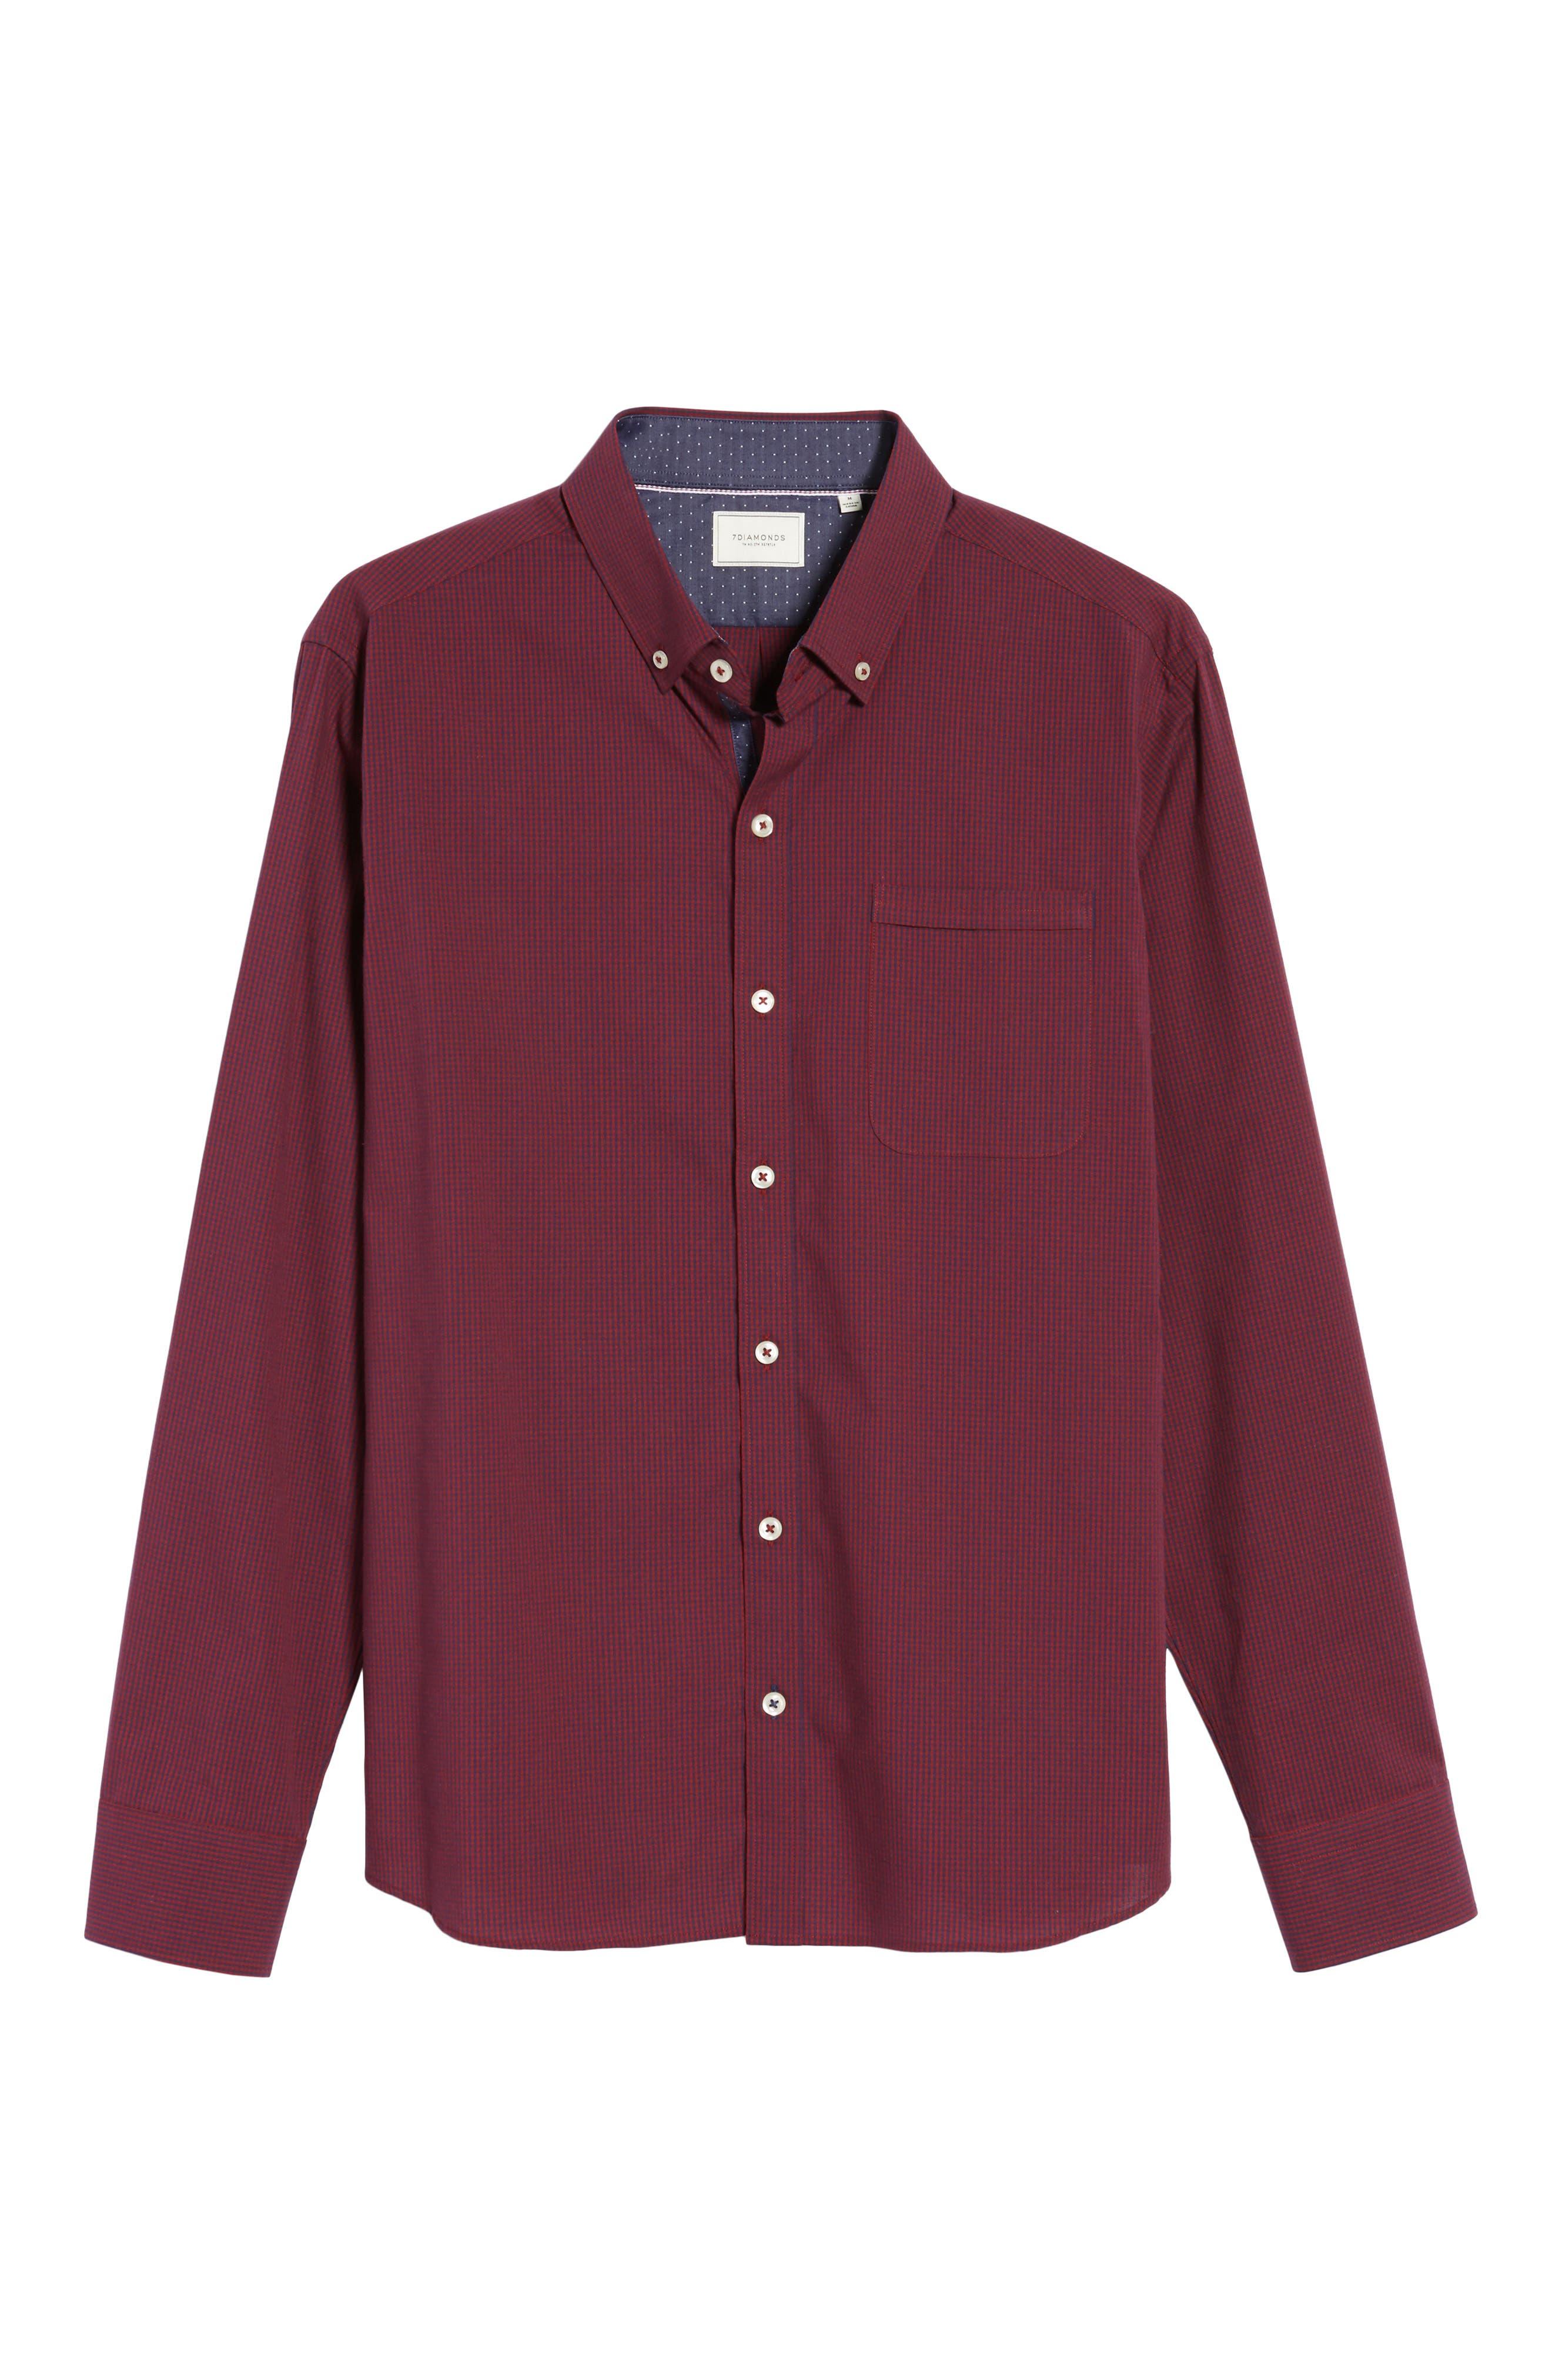 Oracle Woven Shirt,                             Alternate thumbnail 6, color,                             600